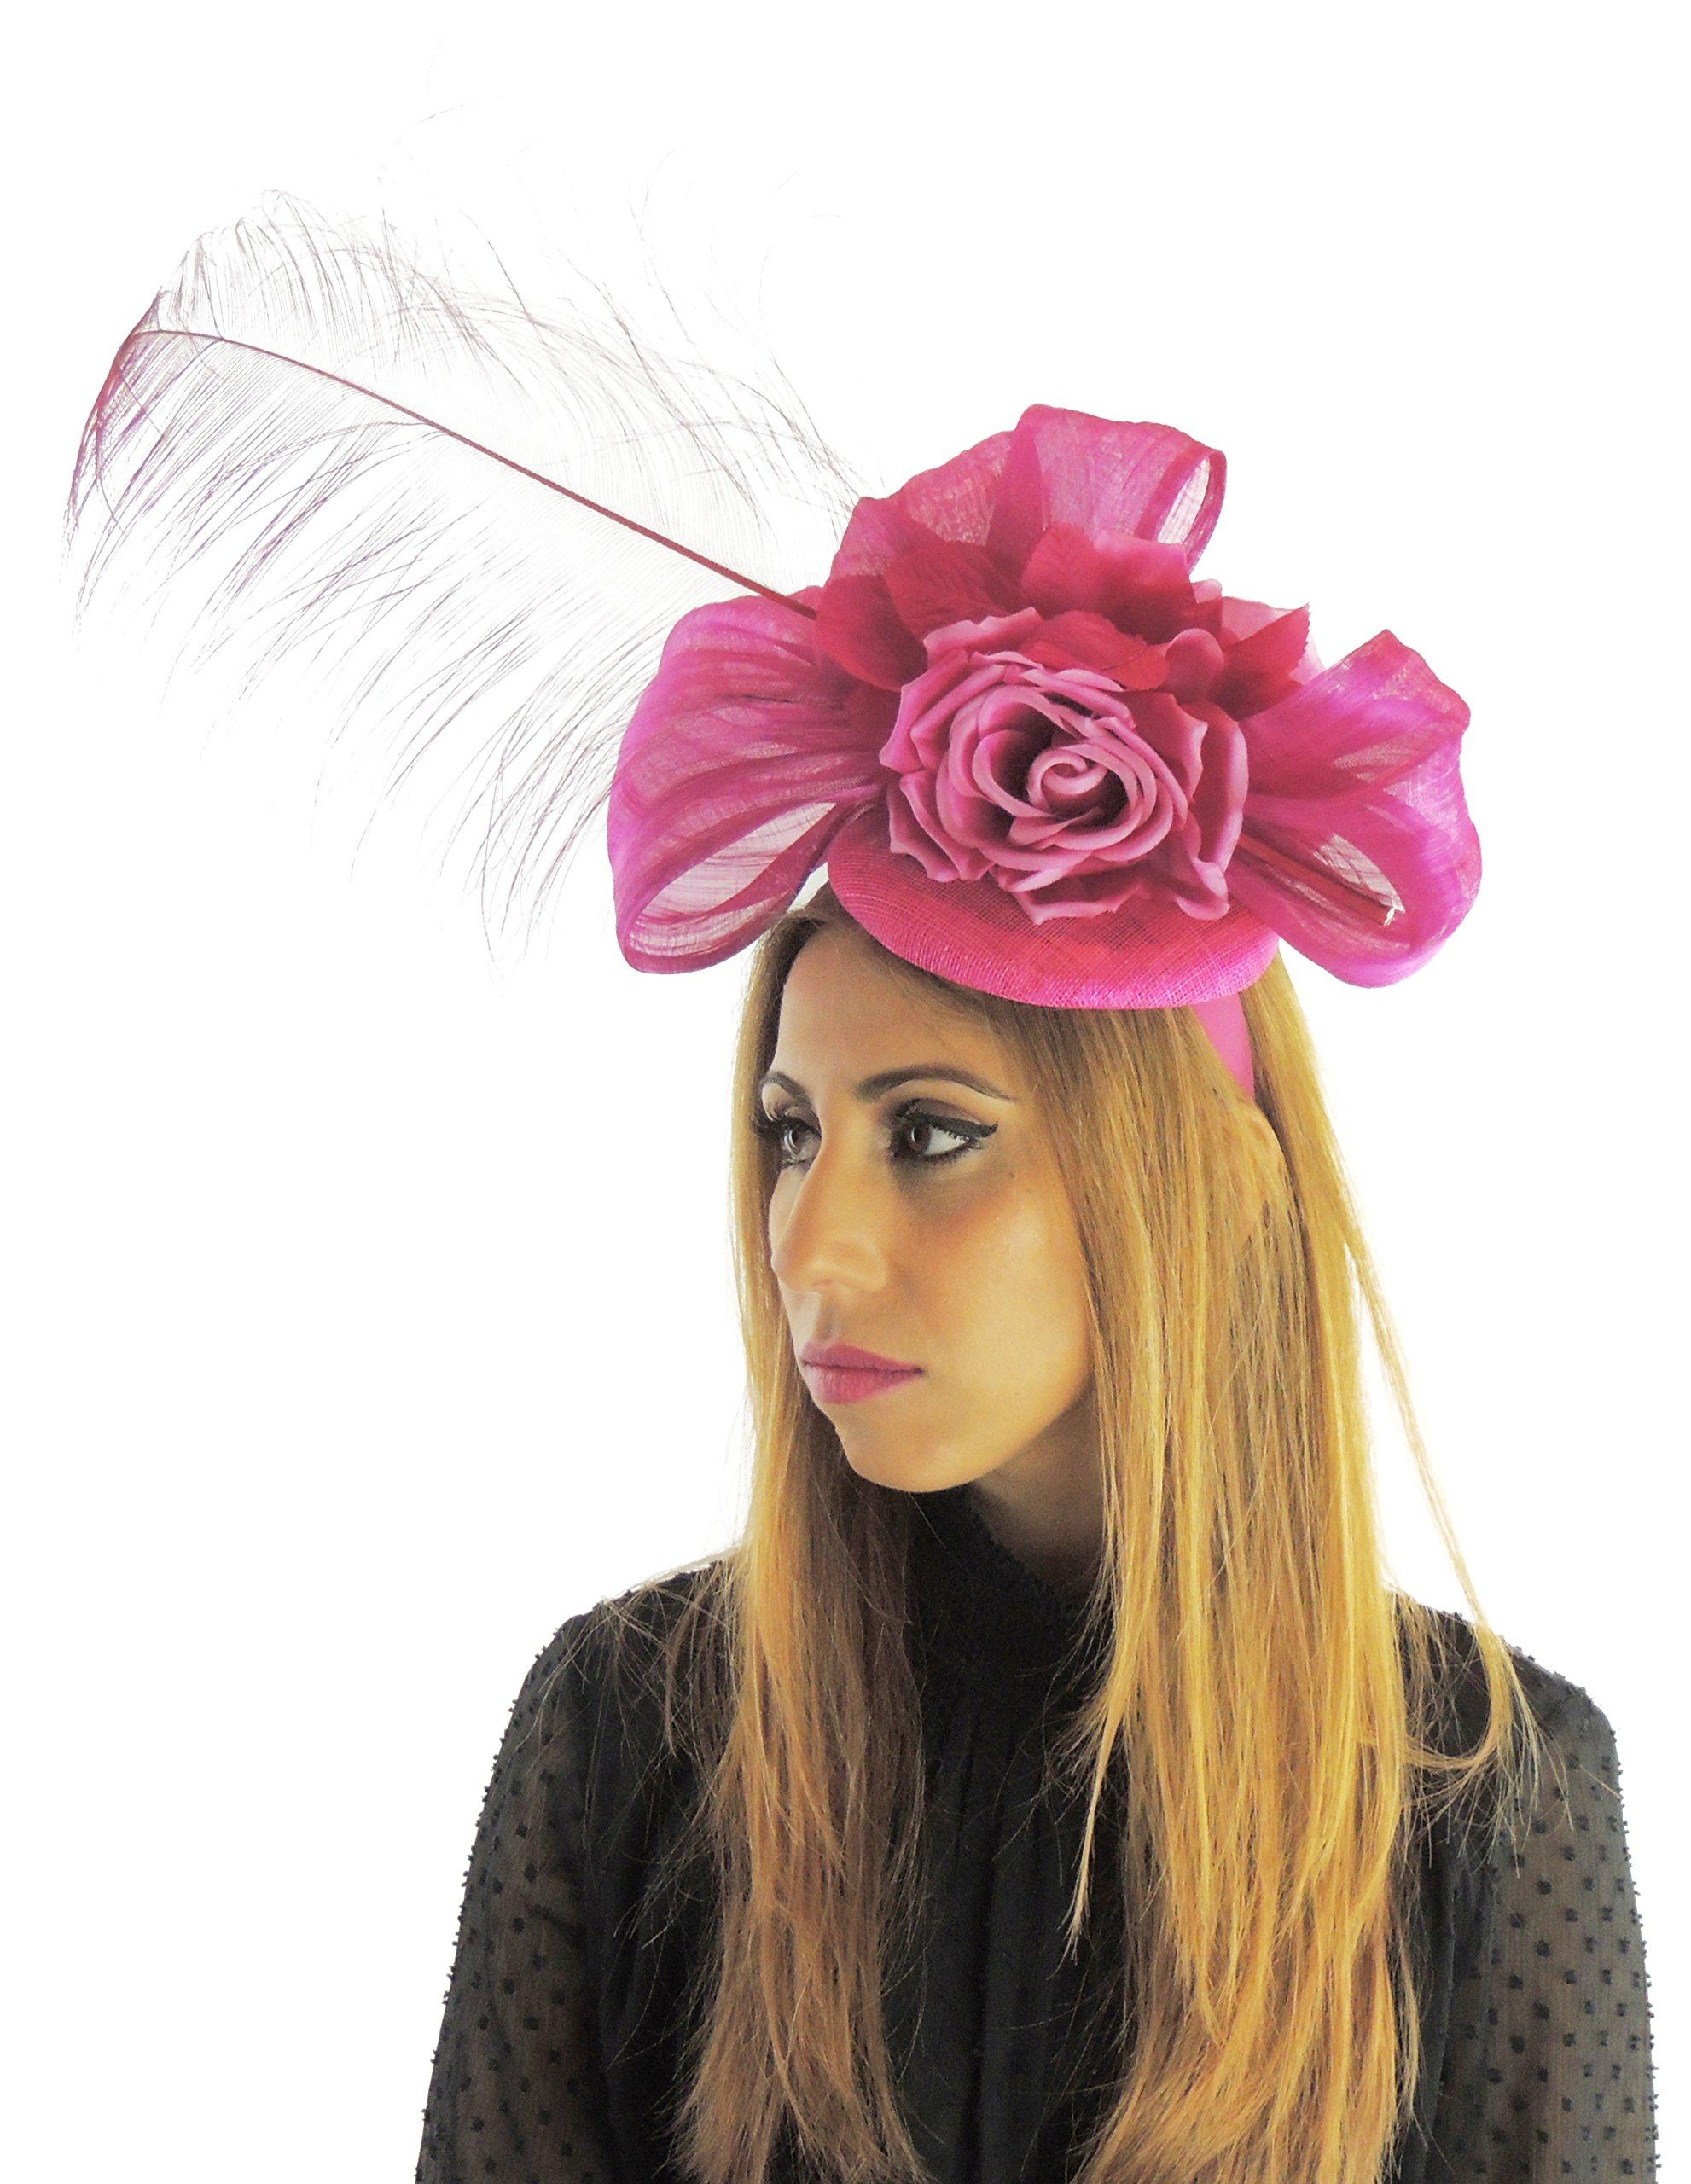 Hats By Cressida Silk Sinamay & Silk Flower Elegant Ladies Ascot Wedding Fascinator Hat Cerise Pink by Hats By Cressida